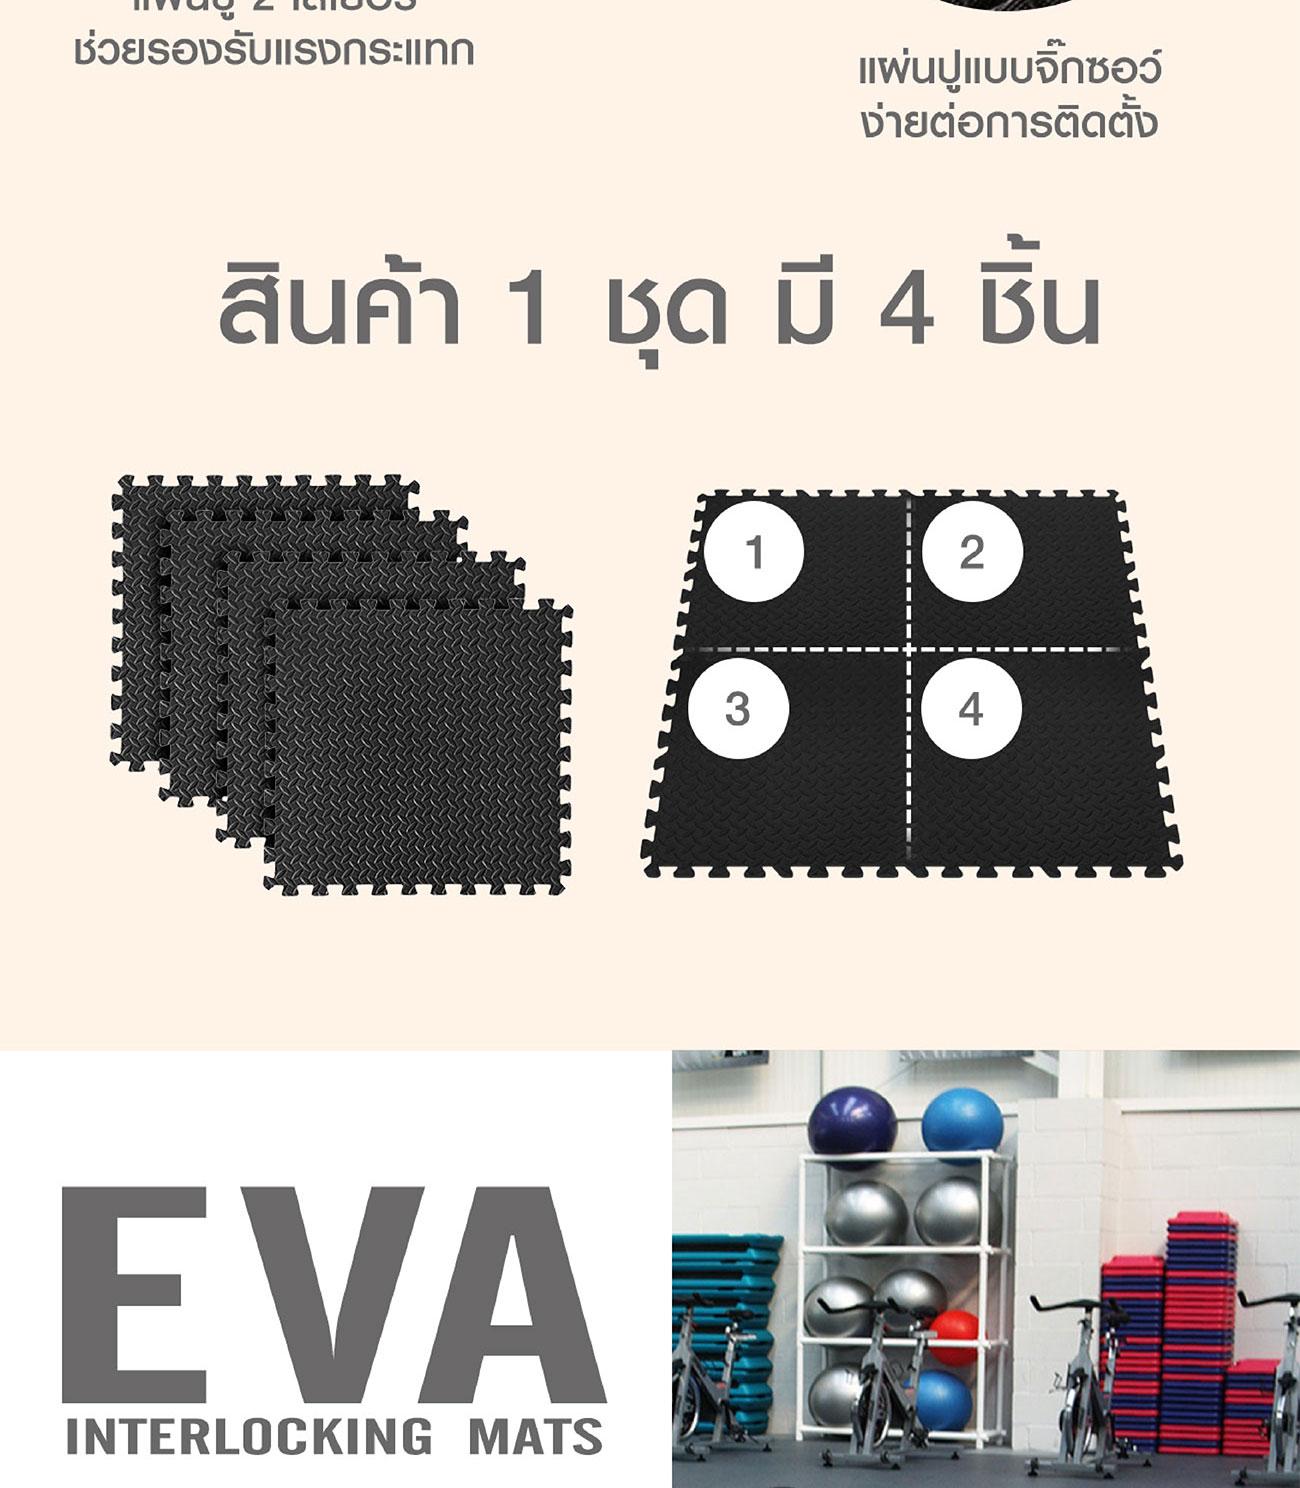 Eva Interlocking mats